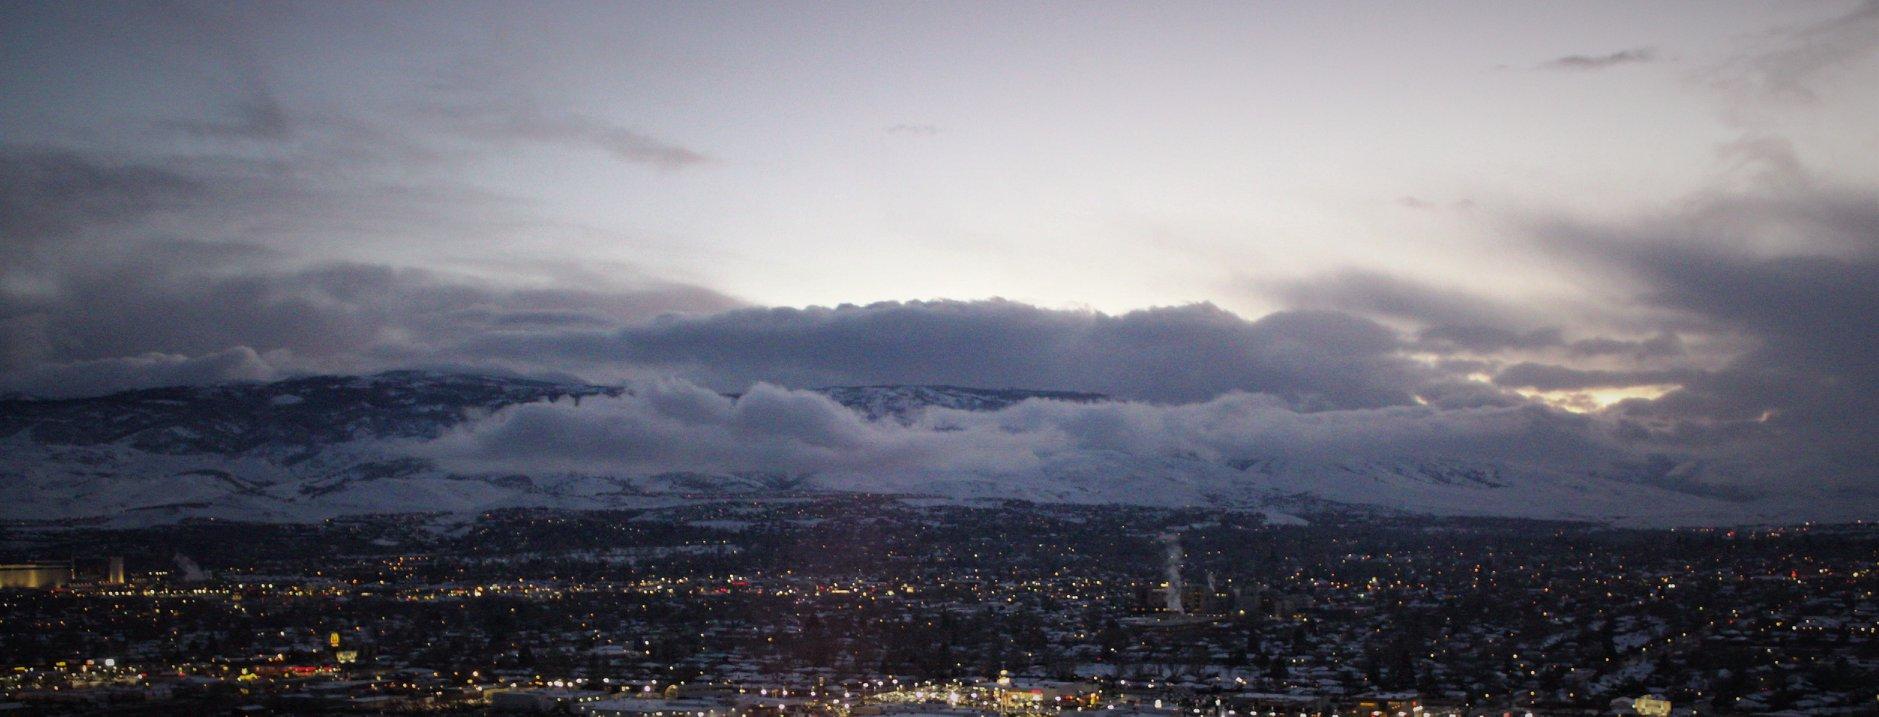 Reno Banner Image